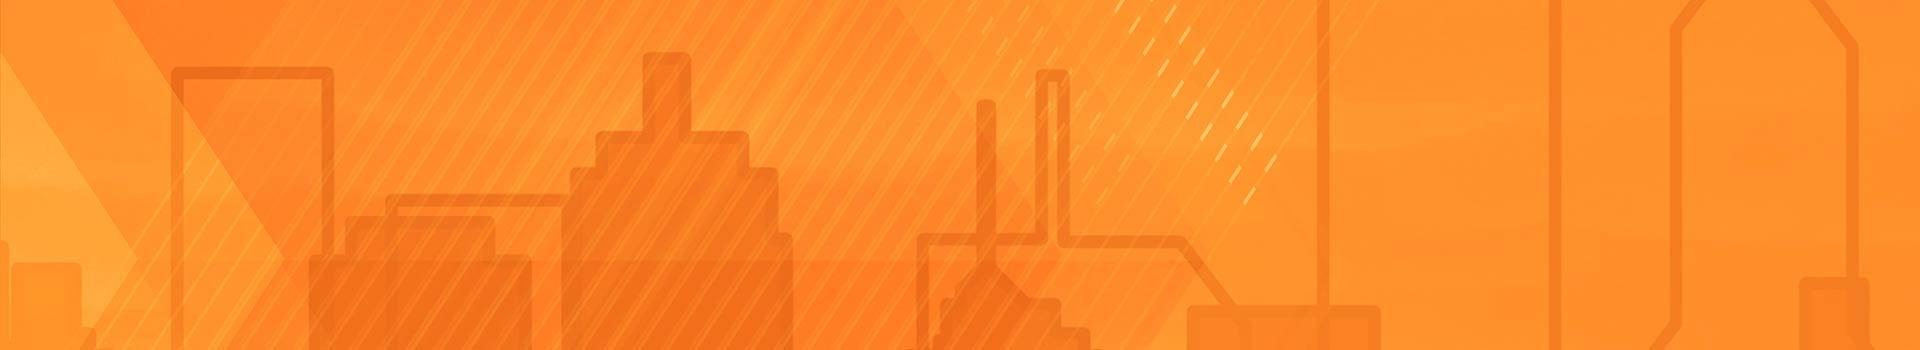 blog_banner_orange2